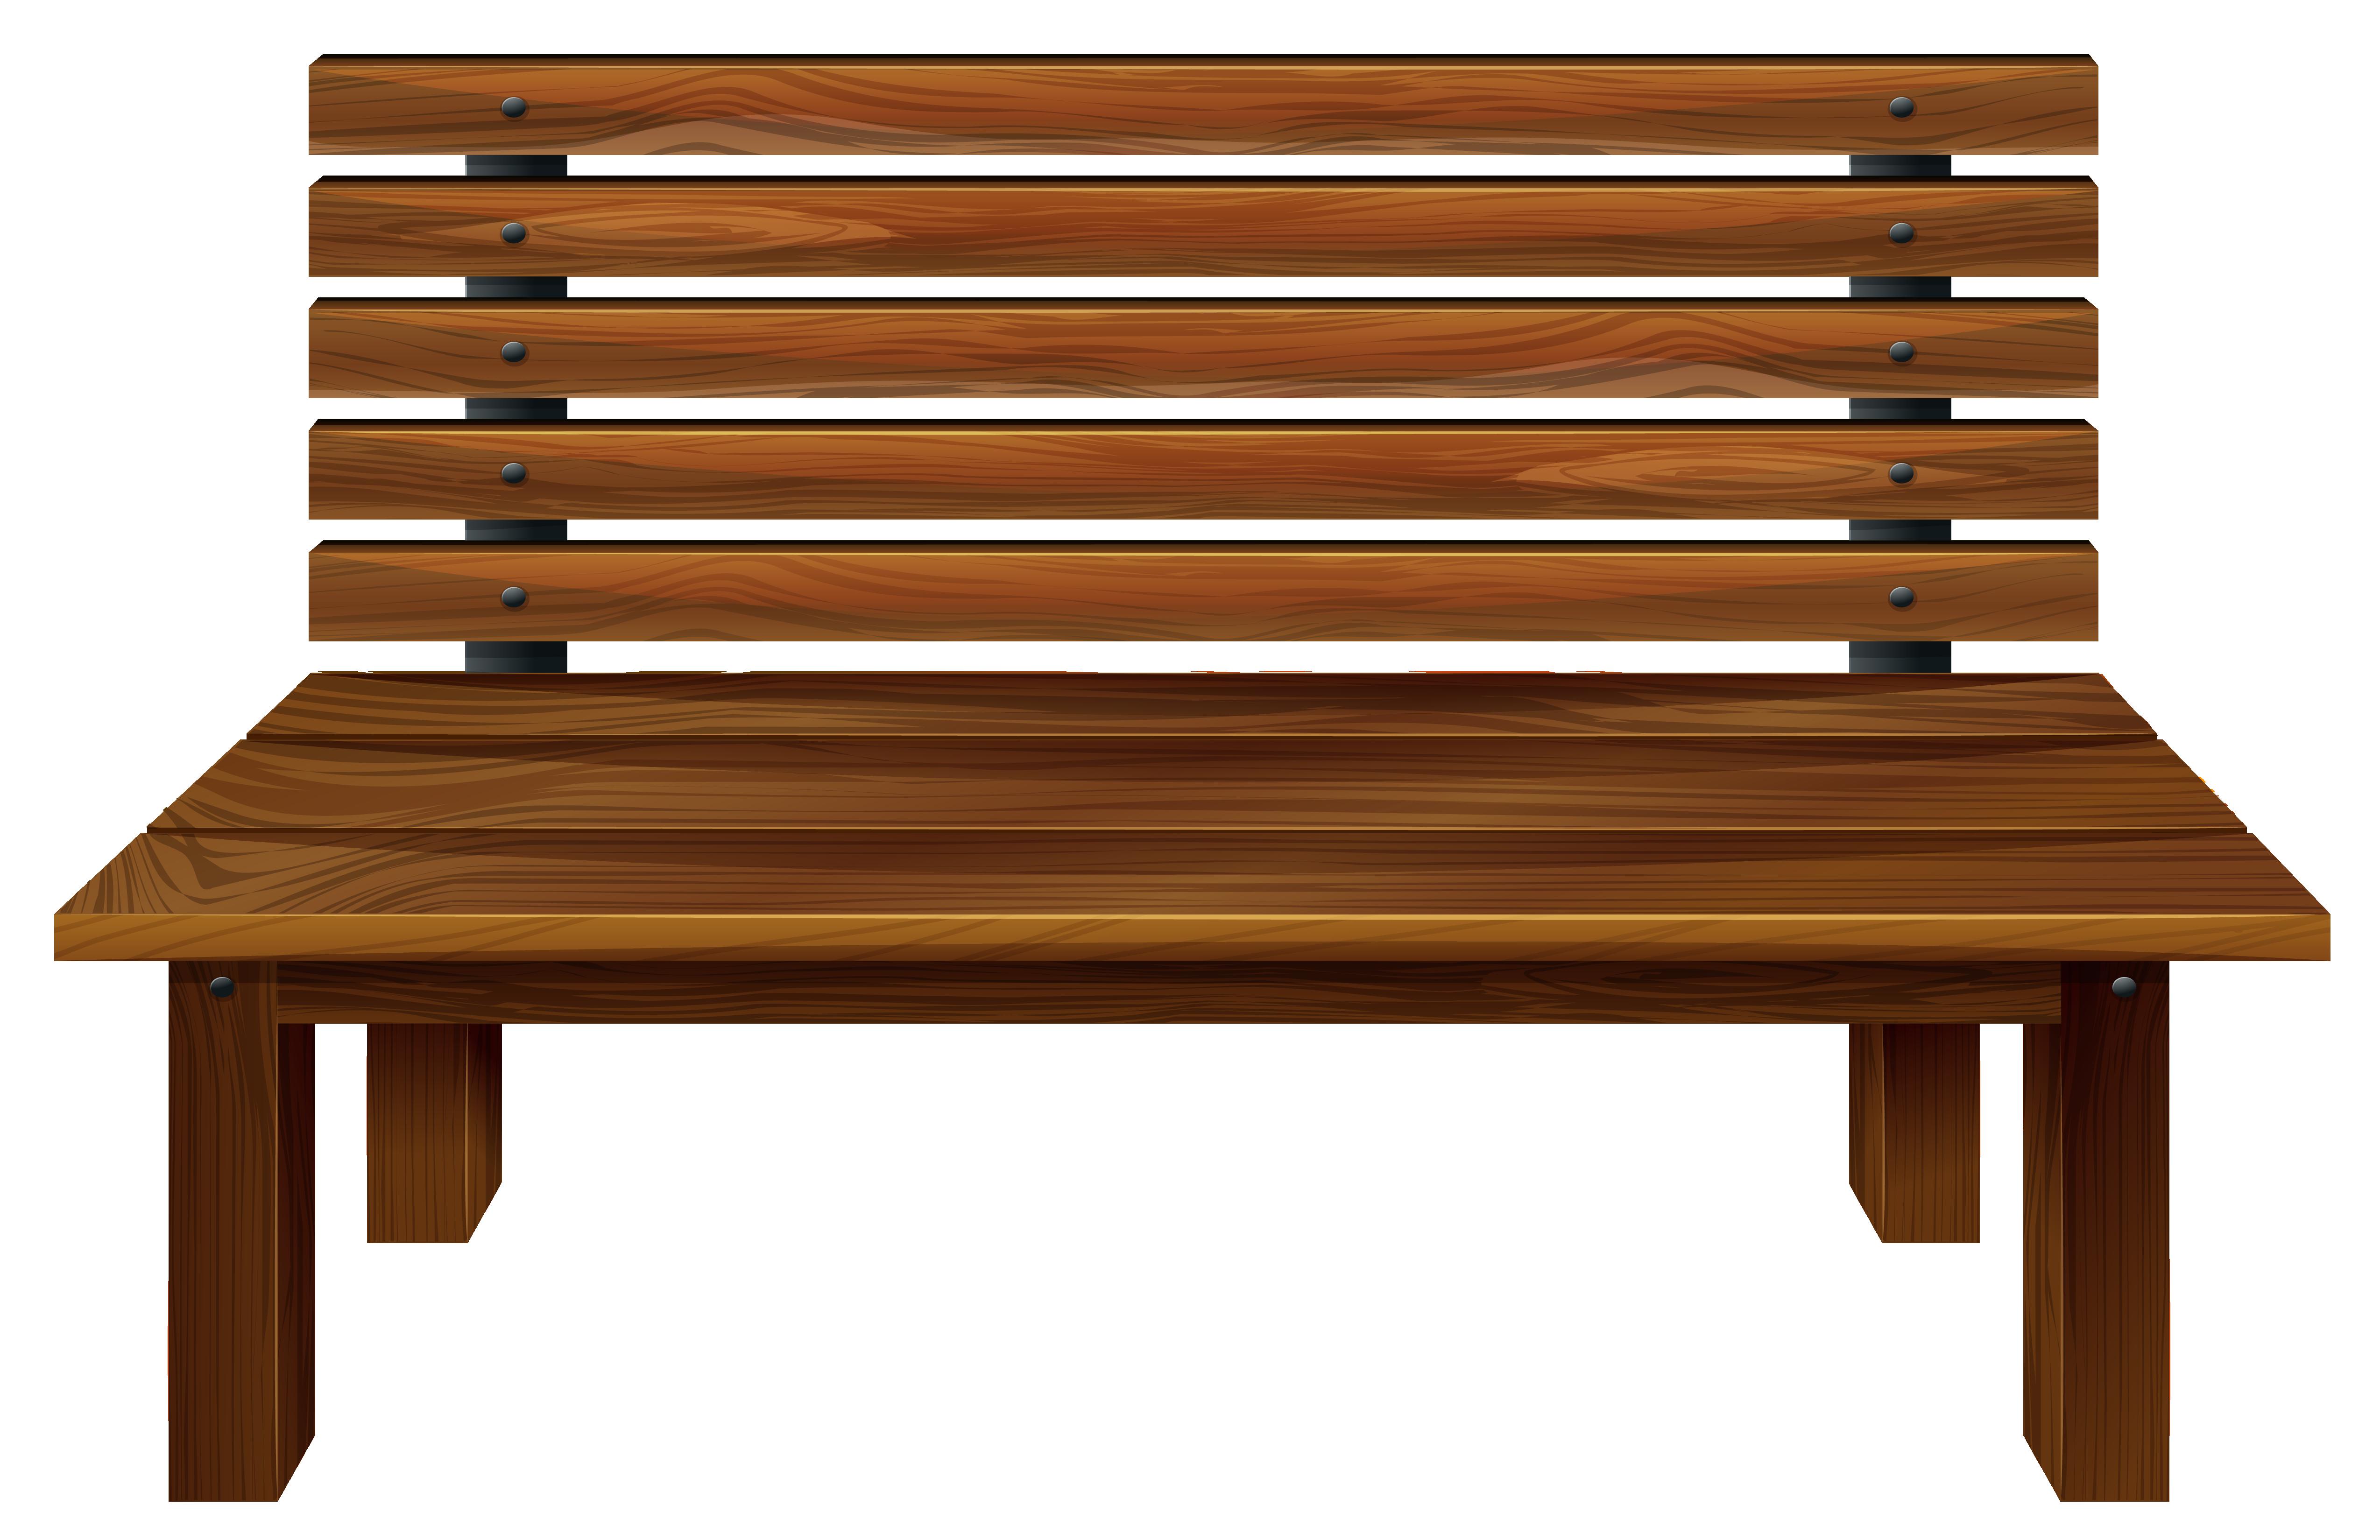 Bench clipart transparent.